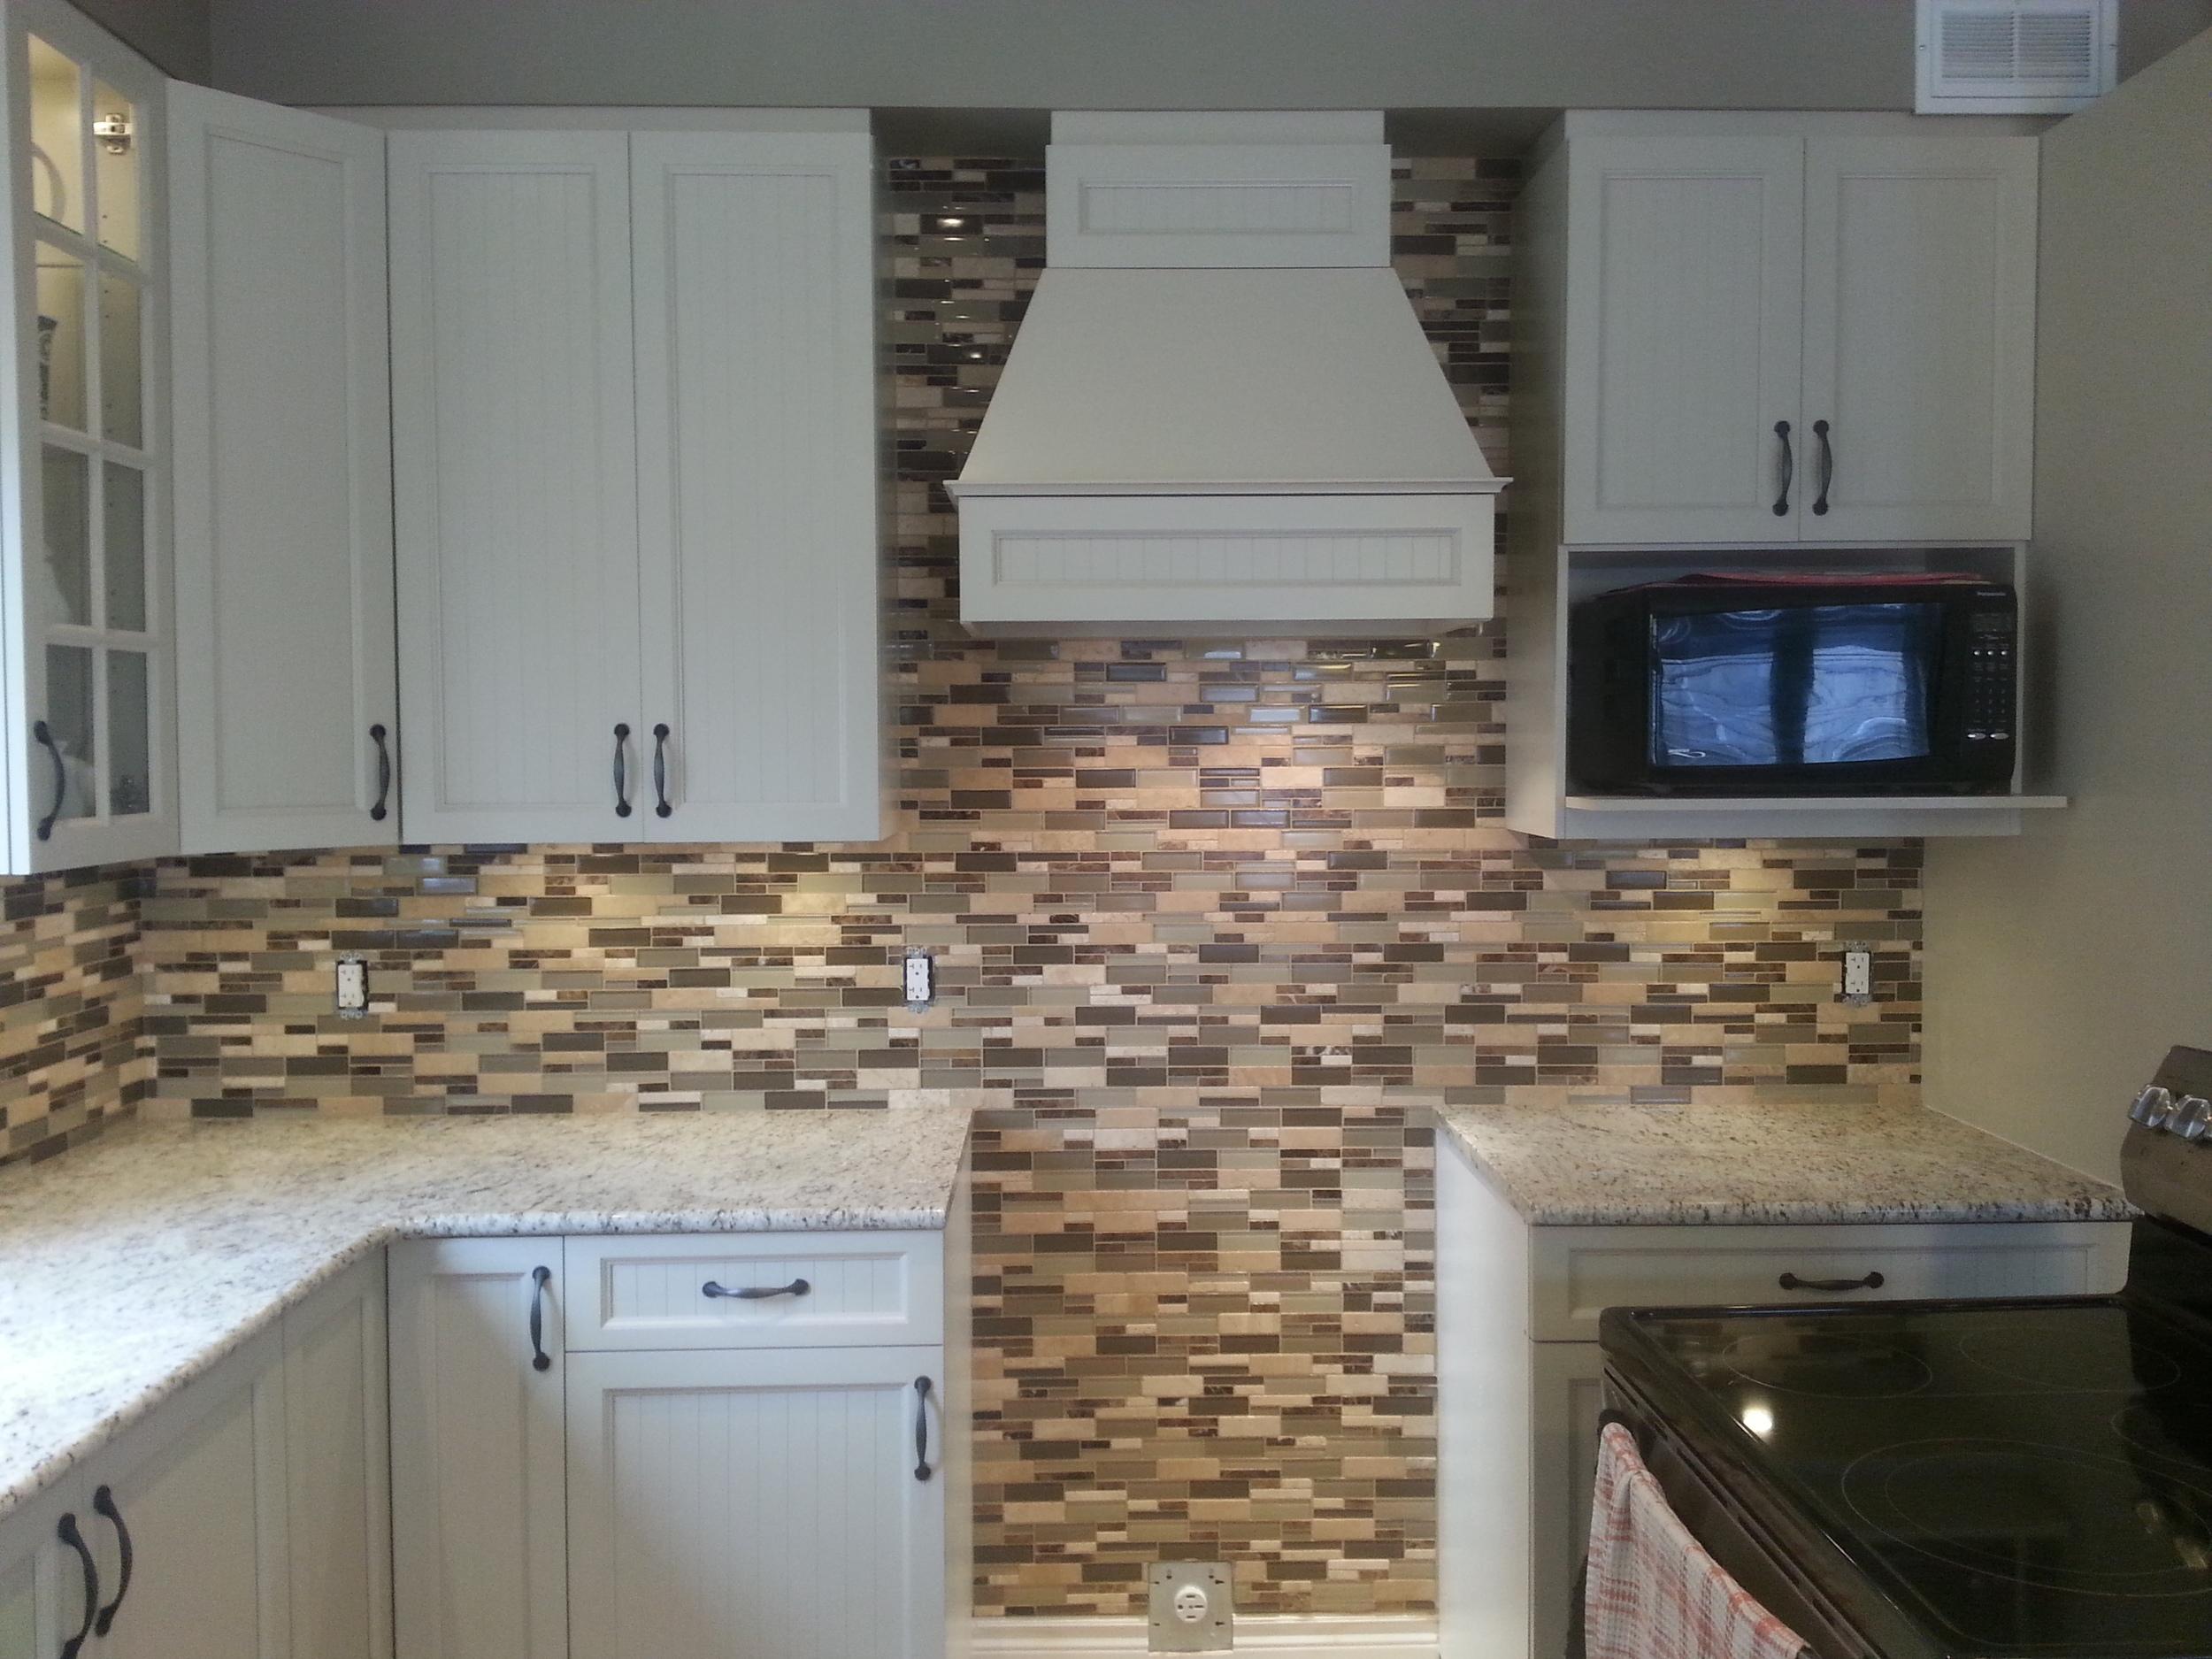 Tile Contractors Work - Kitchen Backsplash (9).jpg